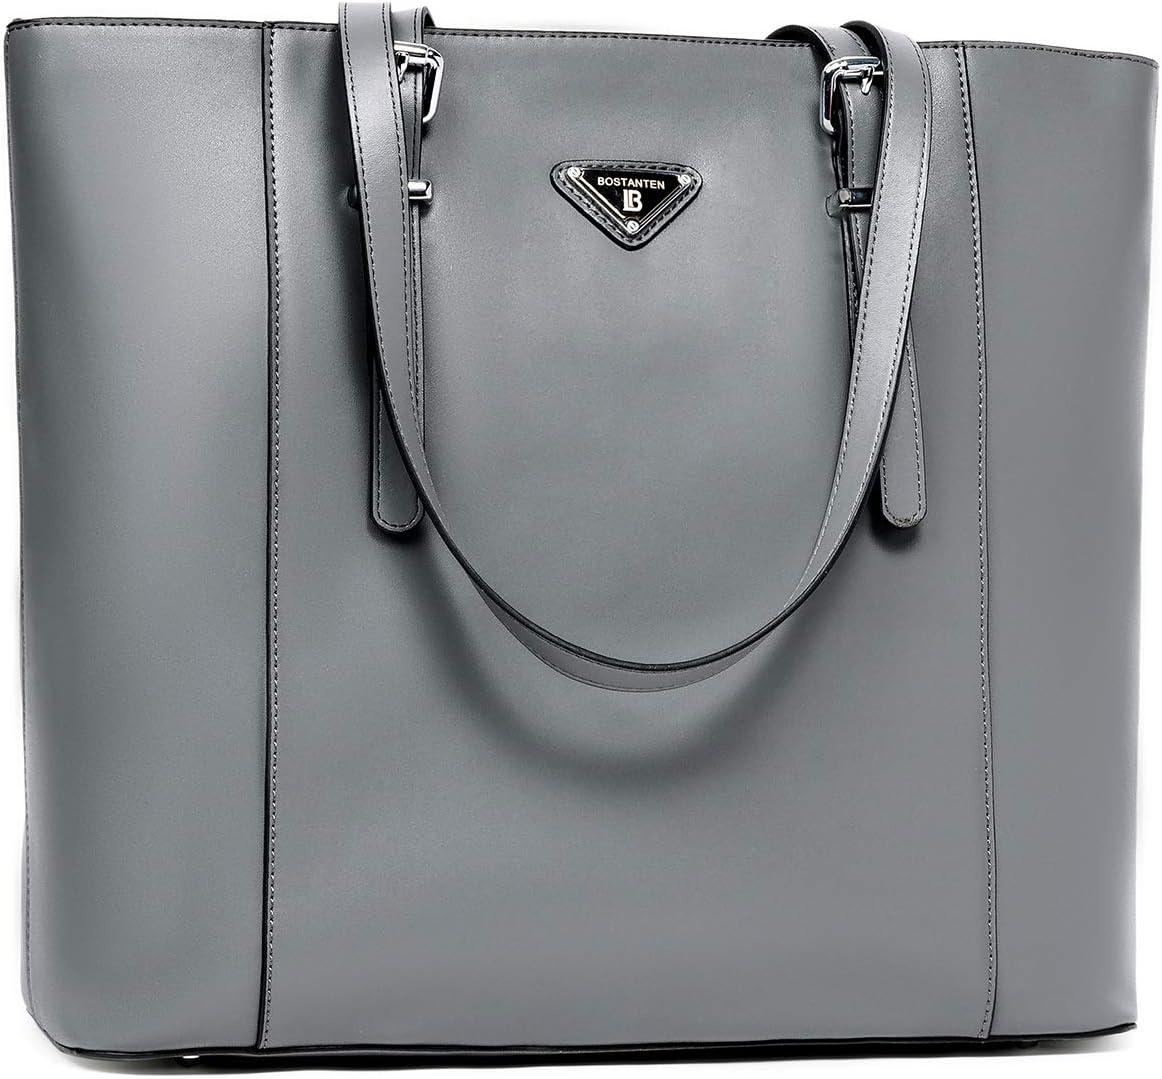 BOSTANTEN Women Briefcase Leather Laptop Tote Handbags 15.6 inch Computer Shoulder Bags Gray